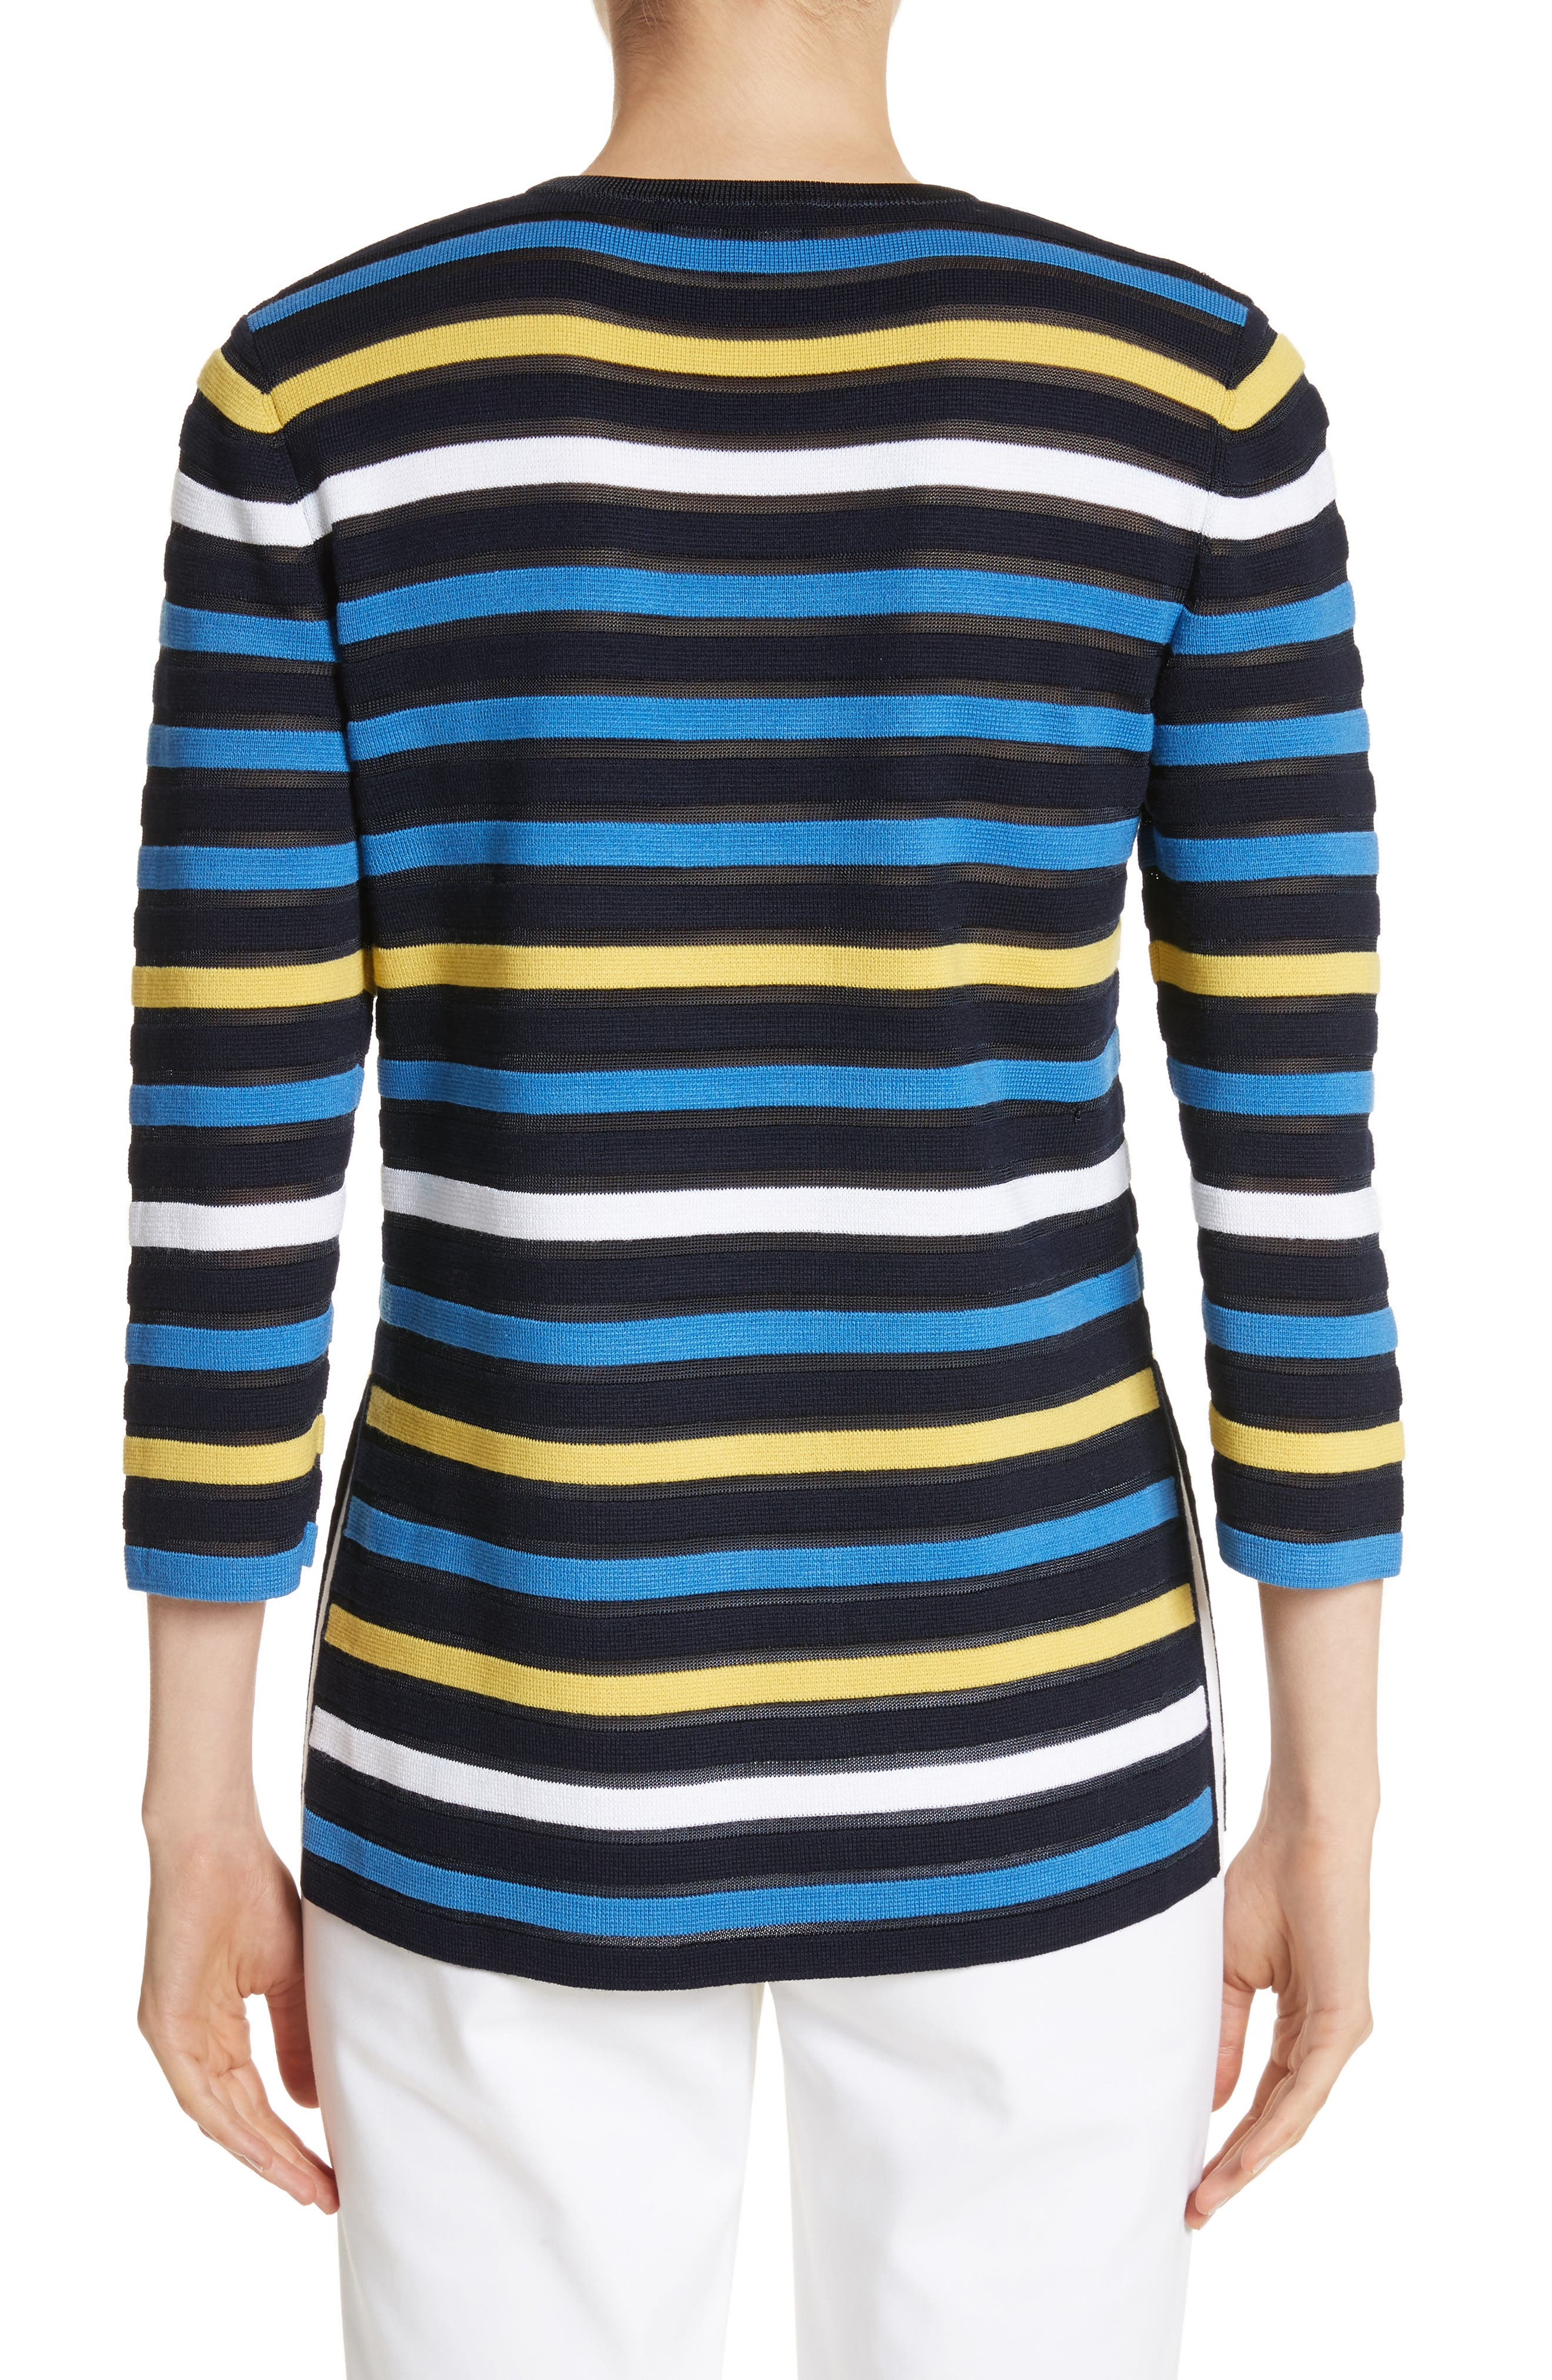 Ombré Stripe Sweater,                             Alternate thumbnail 2, color,                             Navy Multi